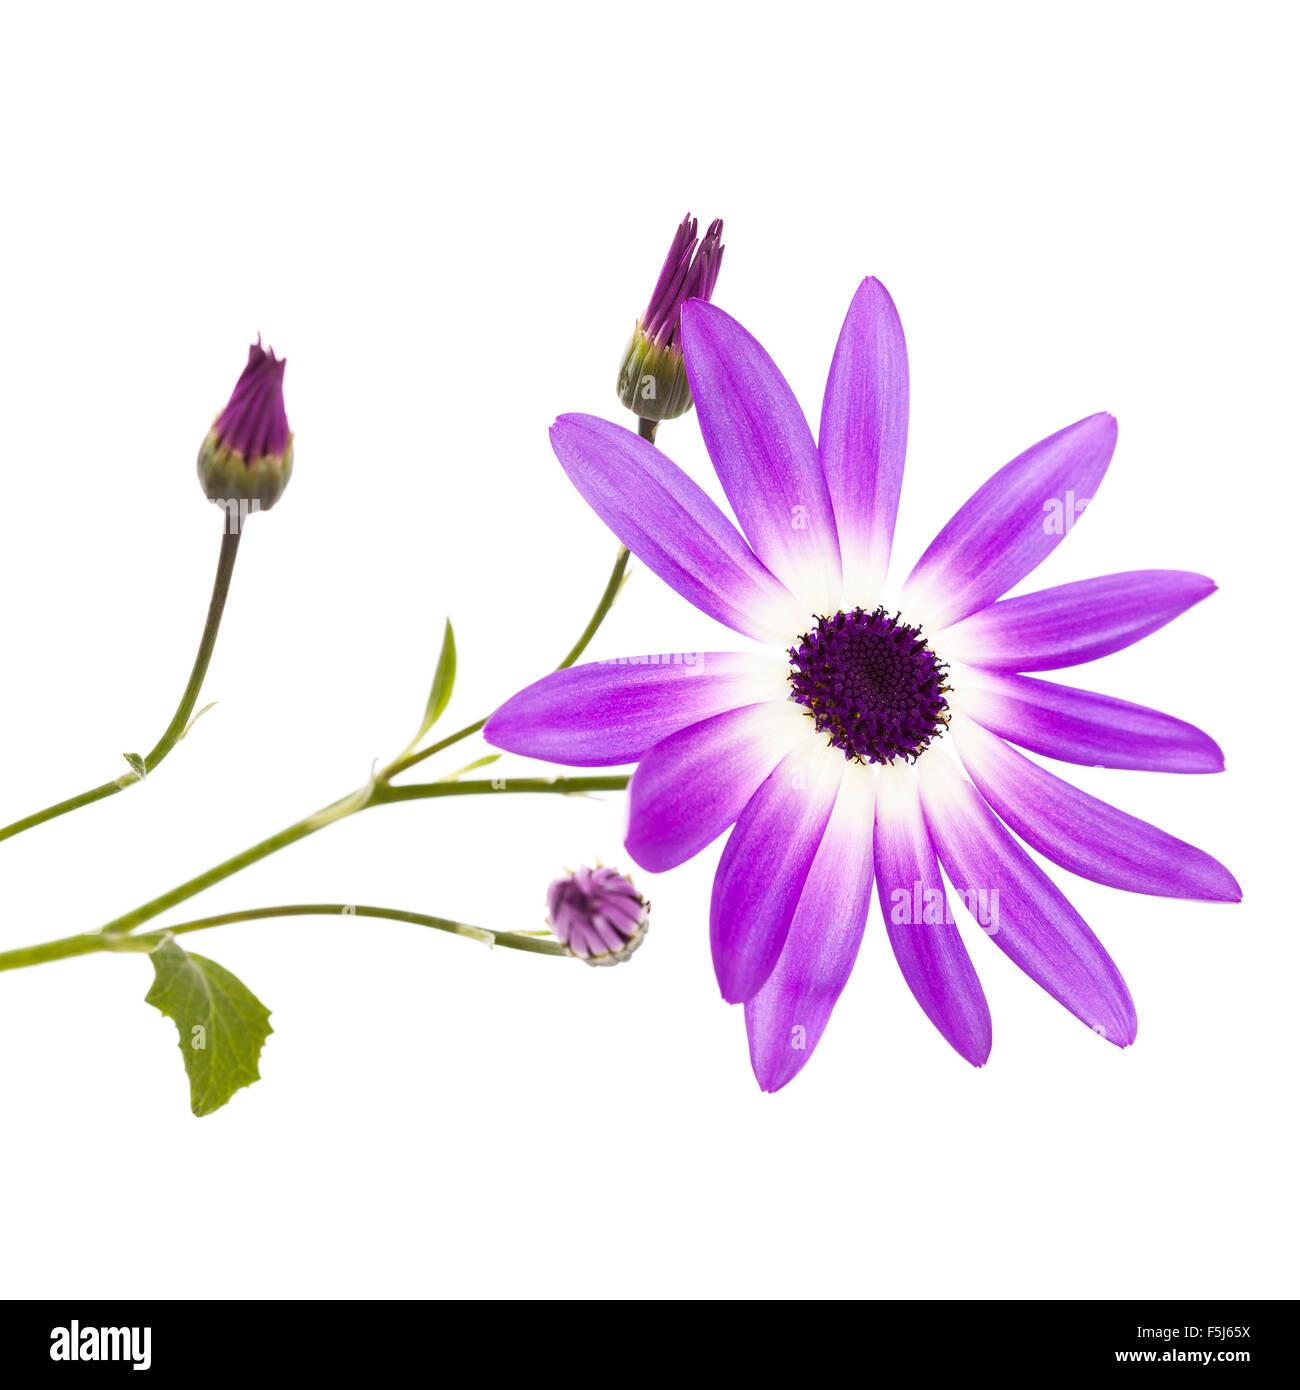 A Purple Cineraria Daisy flower - Stock Image